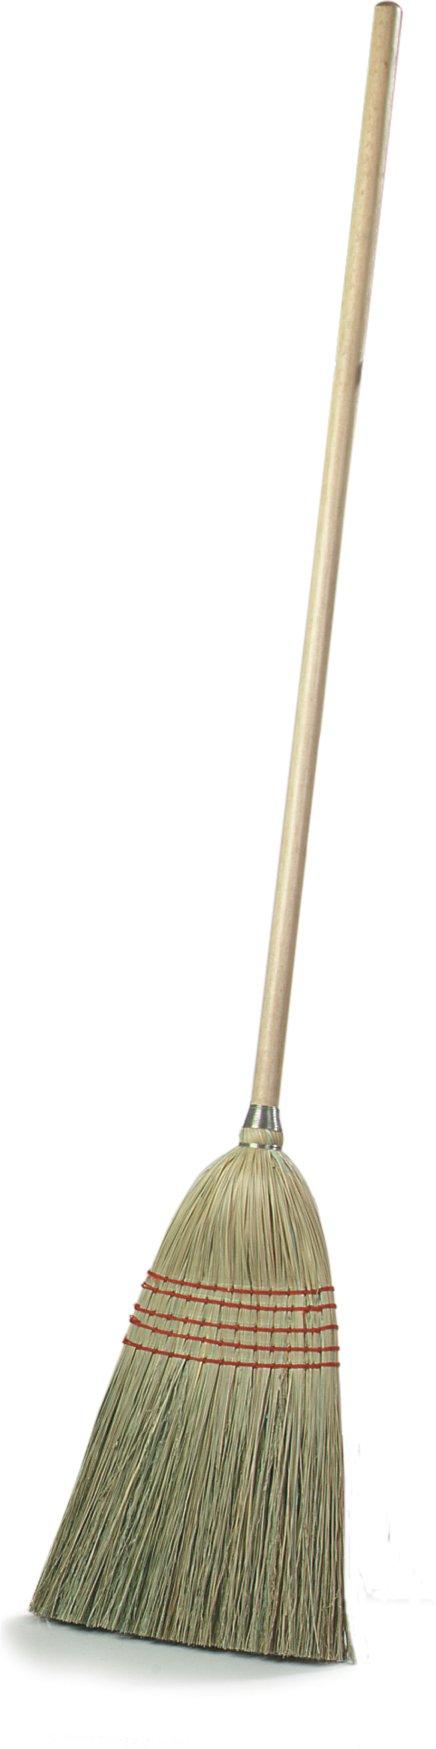 Carlisle 4135200 Flo-Pac Parlor Broom, 55'', Corn Blend